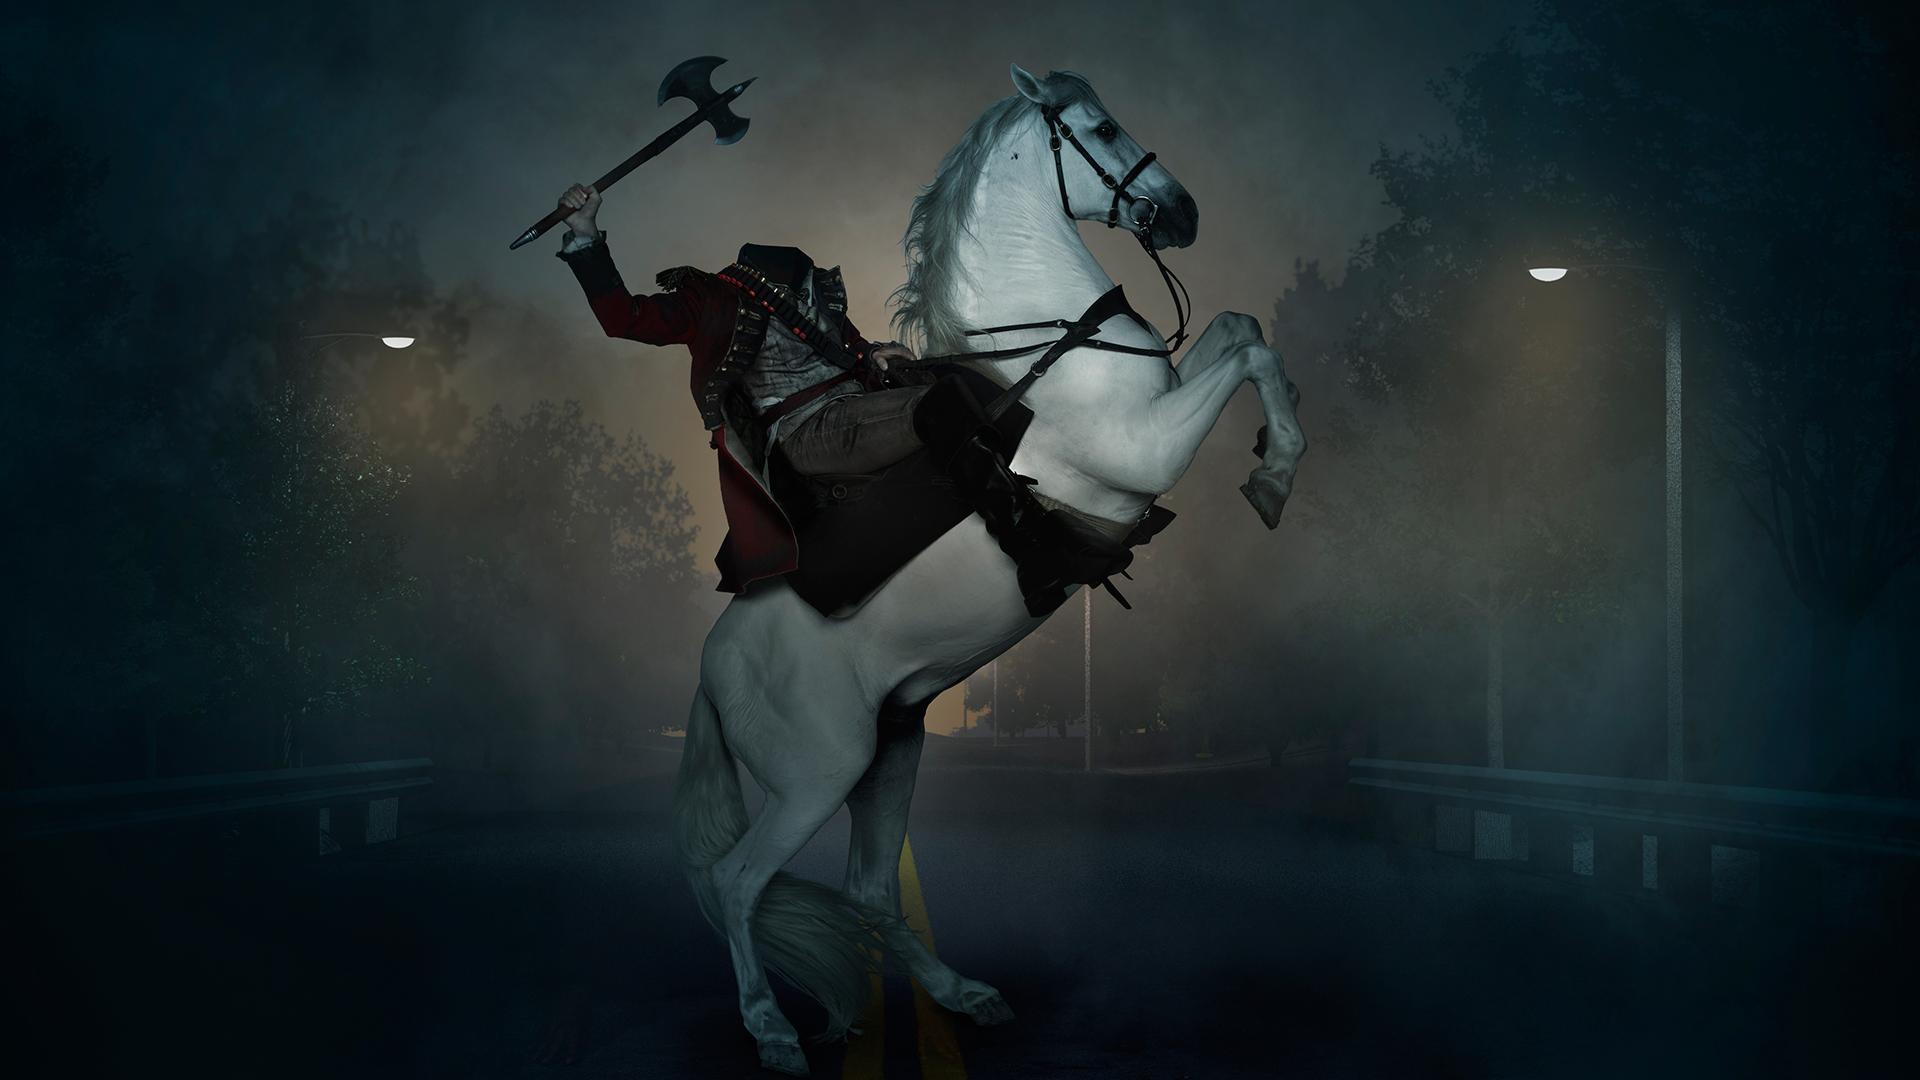 Sleepy hollow season 01 episode 13 on edge tv - Pictures of the headless horseman ...